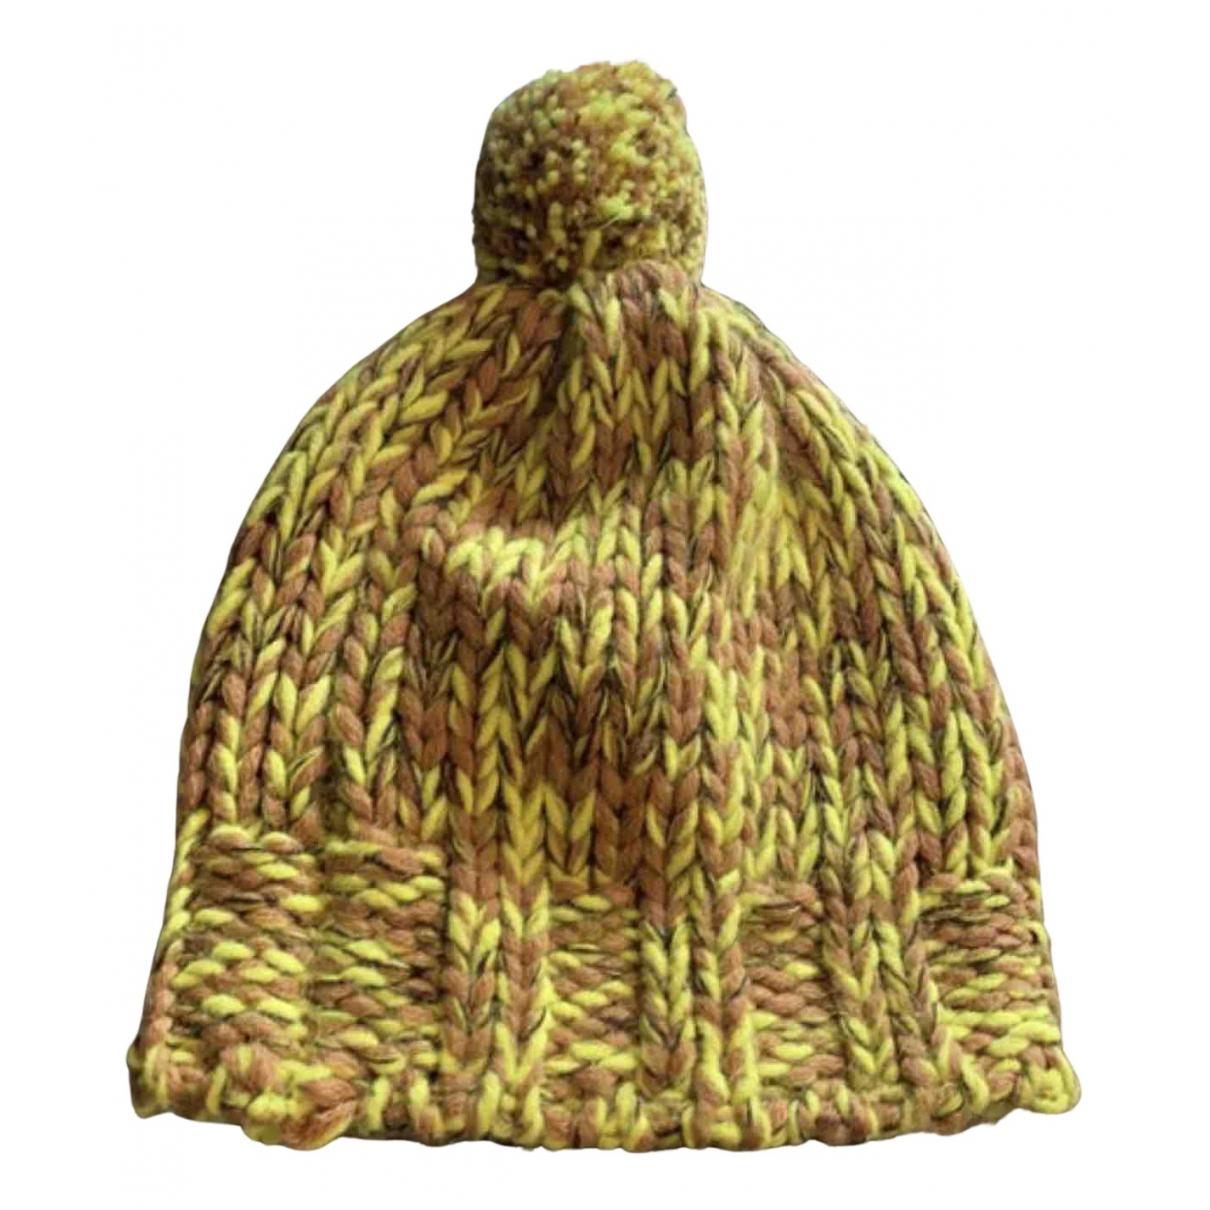 Dolce & Gabbana N Yellow Wool hat & Gloves for Kids N